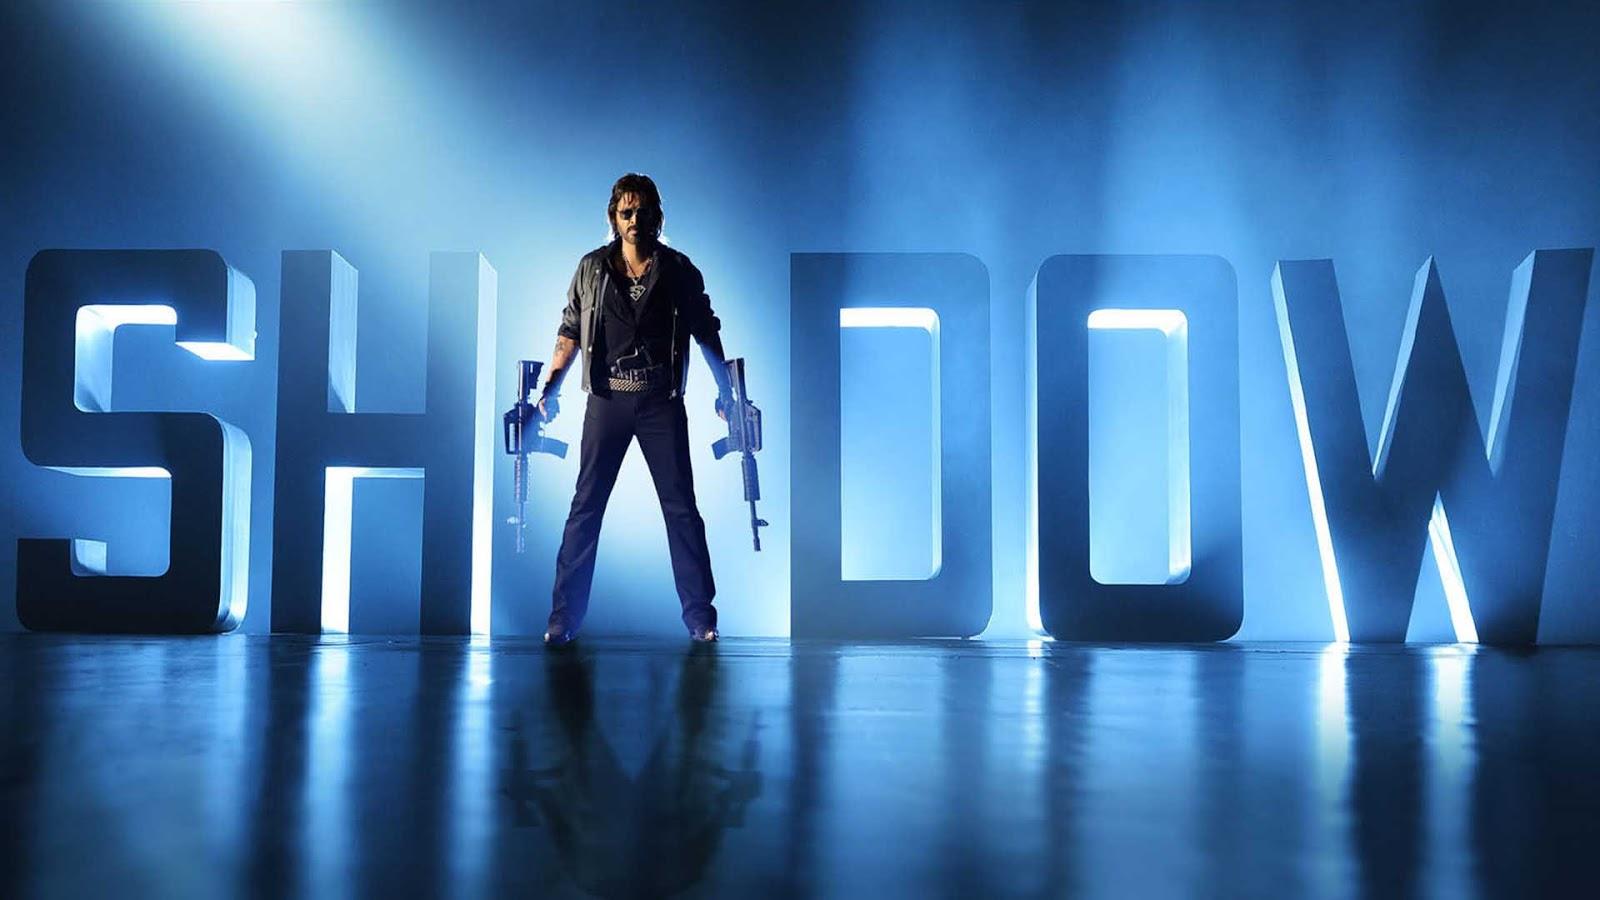 hd filme download 1080p